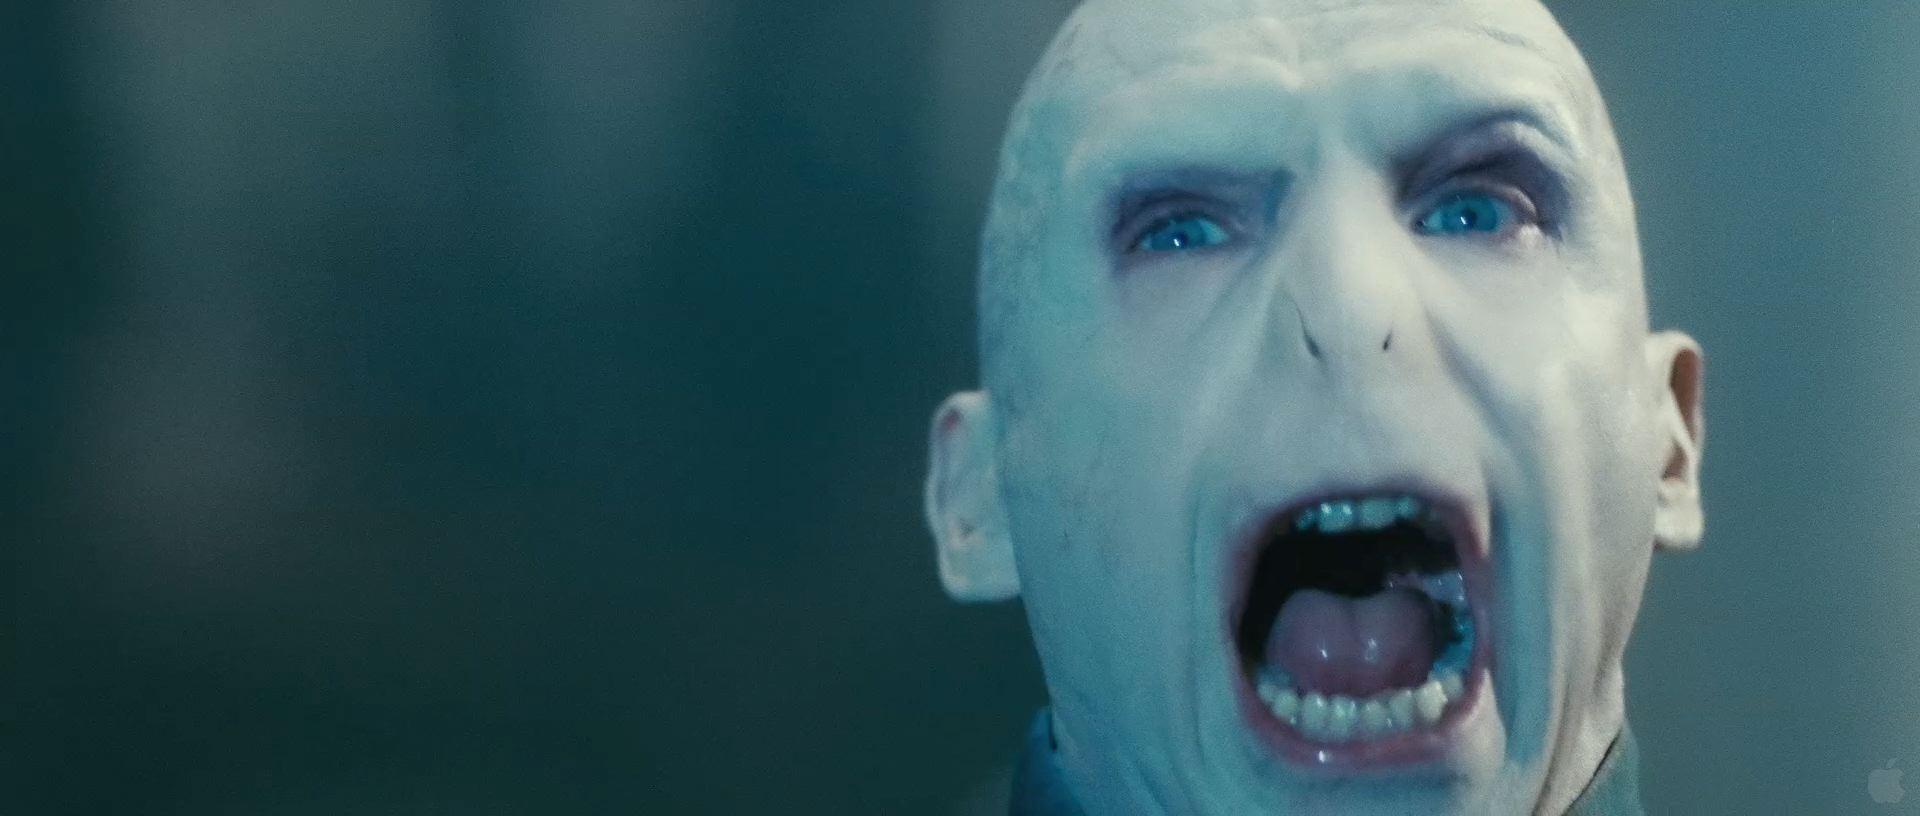 Harry Potter BlogHogwarts HP7 2 Trailer 13